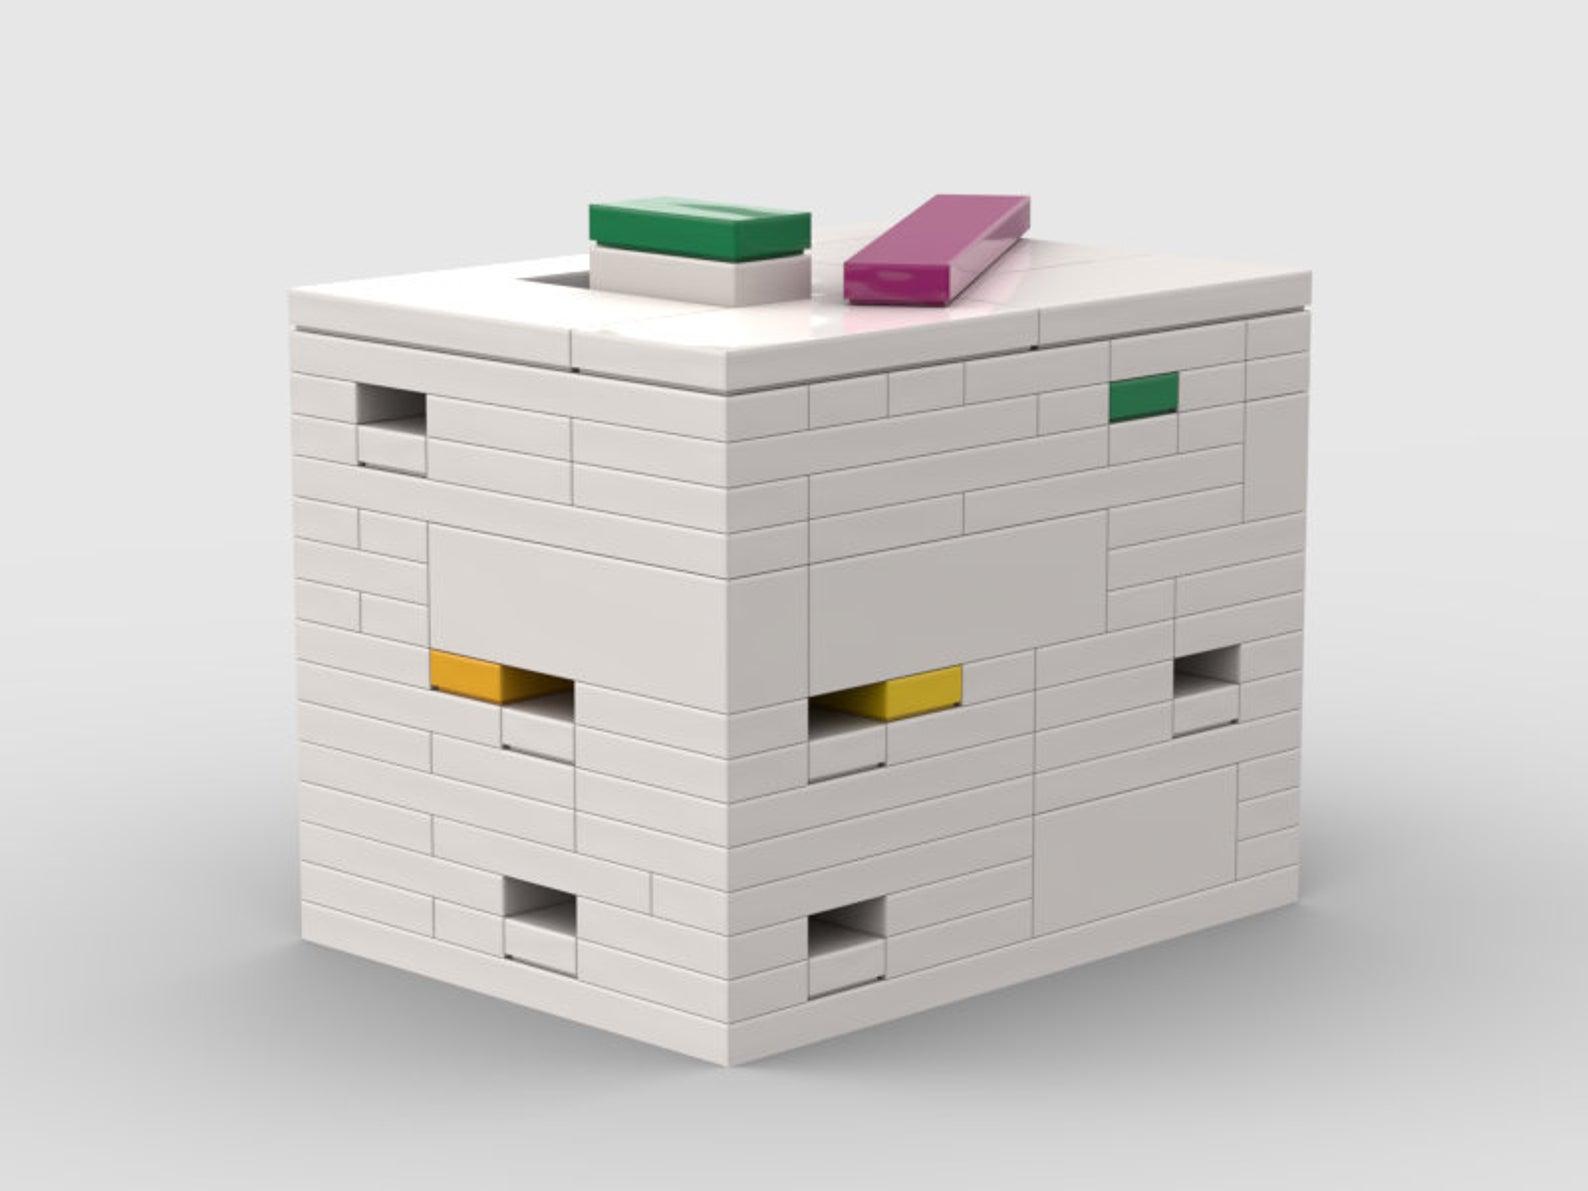 LOCKS BOX - Puzzle Box by cheat3